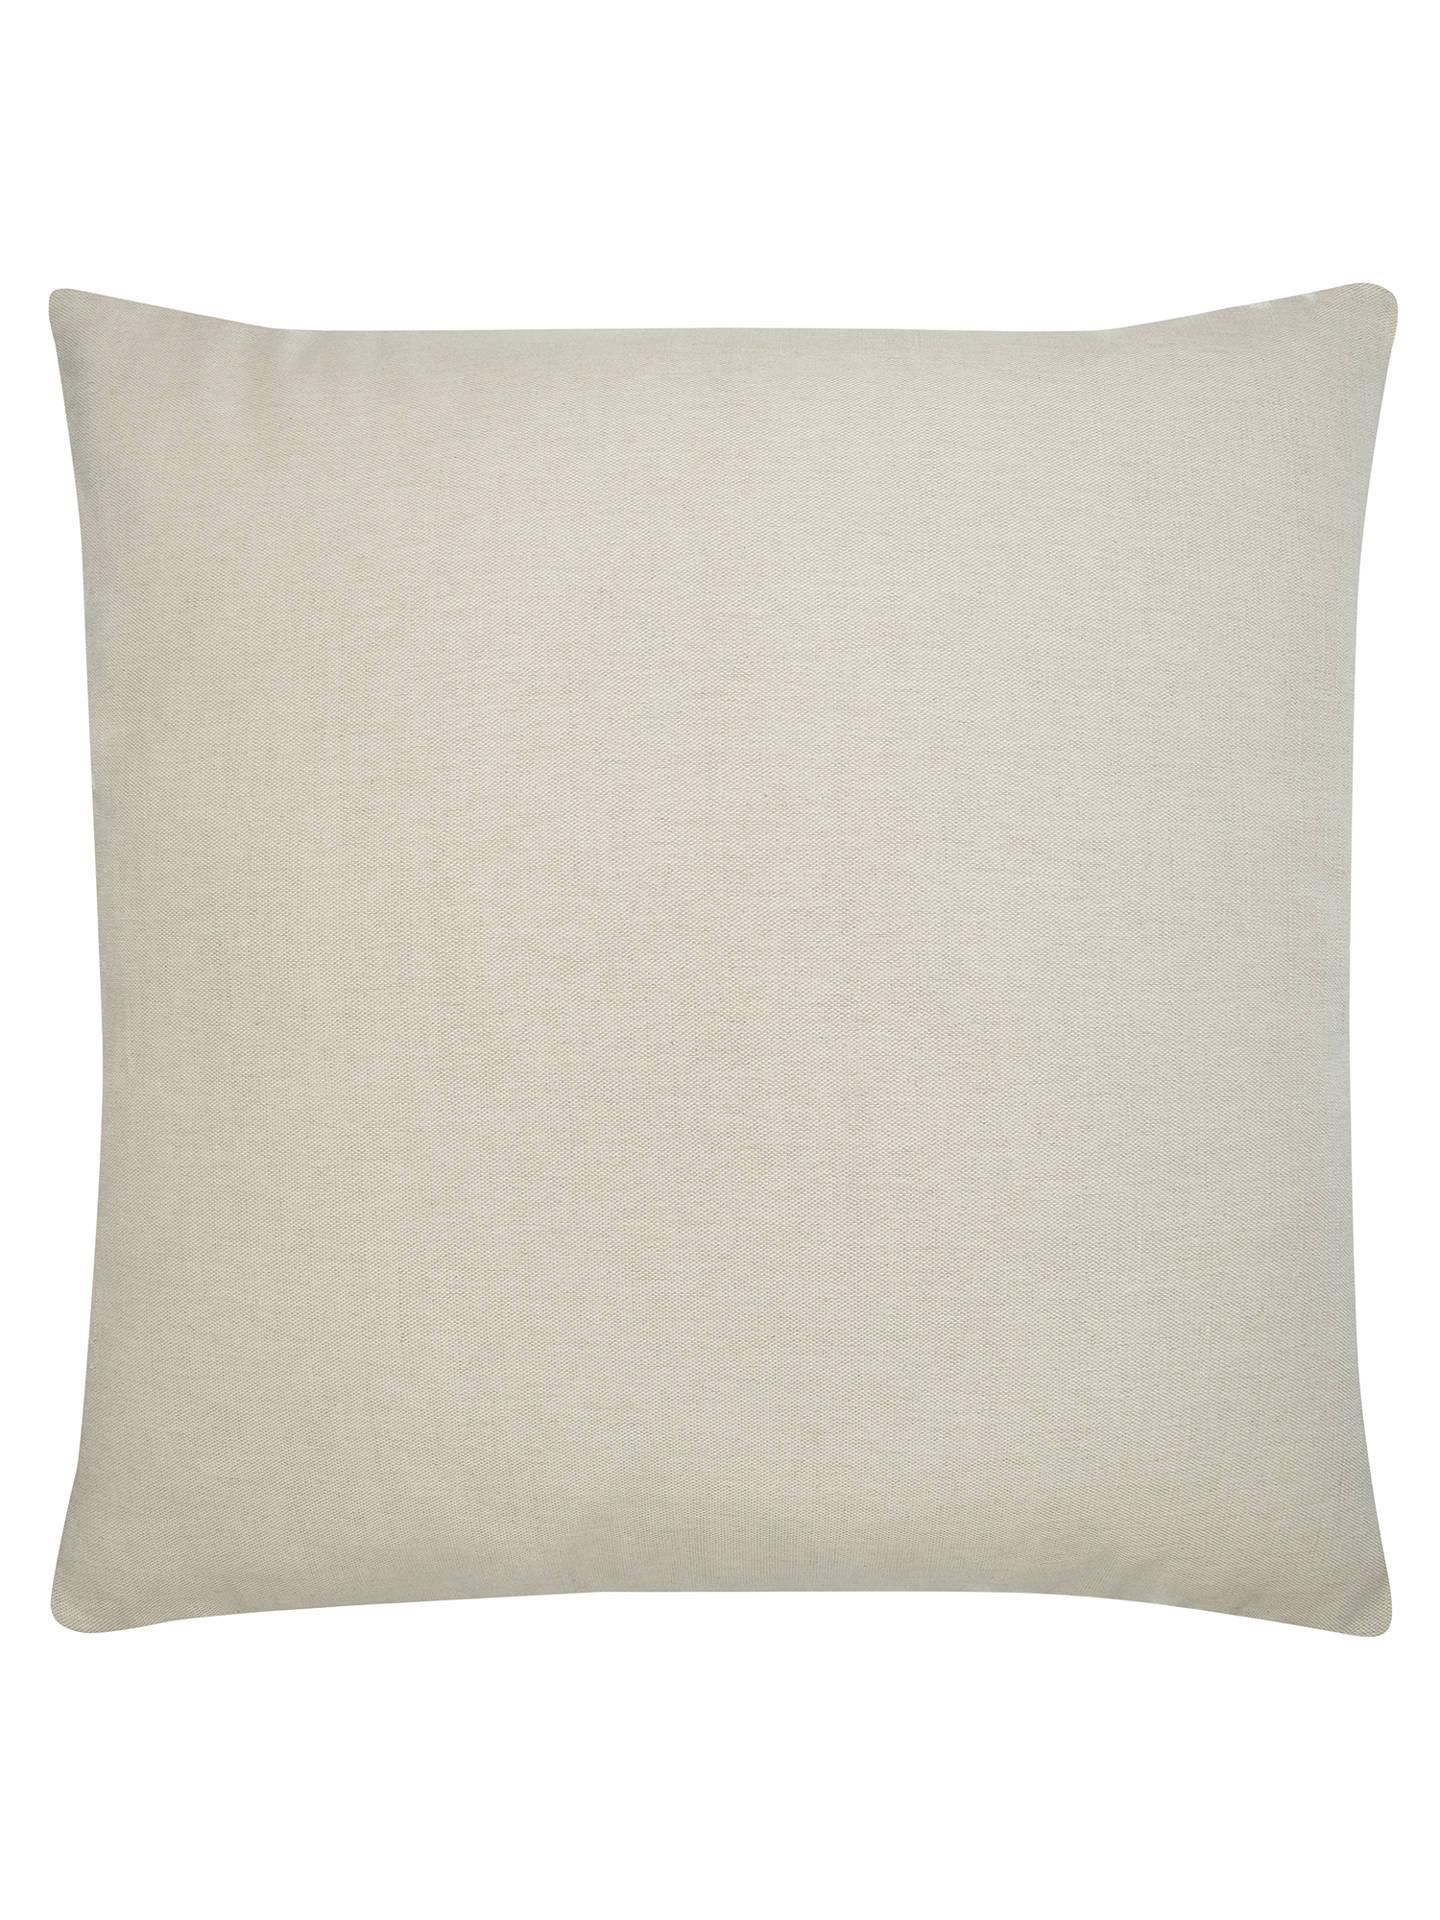 john lewis poppy cushion at john lewis partners. Black Bedroom Furniture Sets. Home Design Ideas